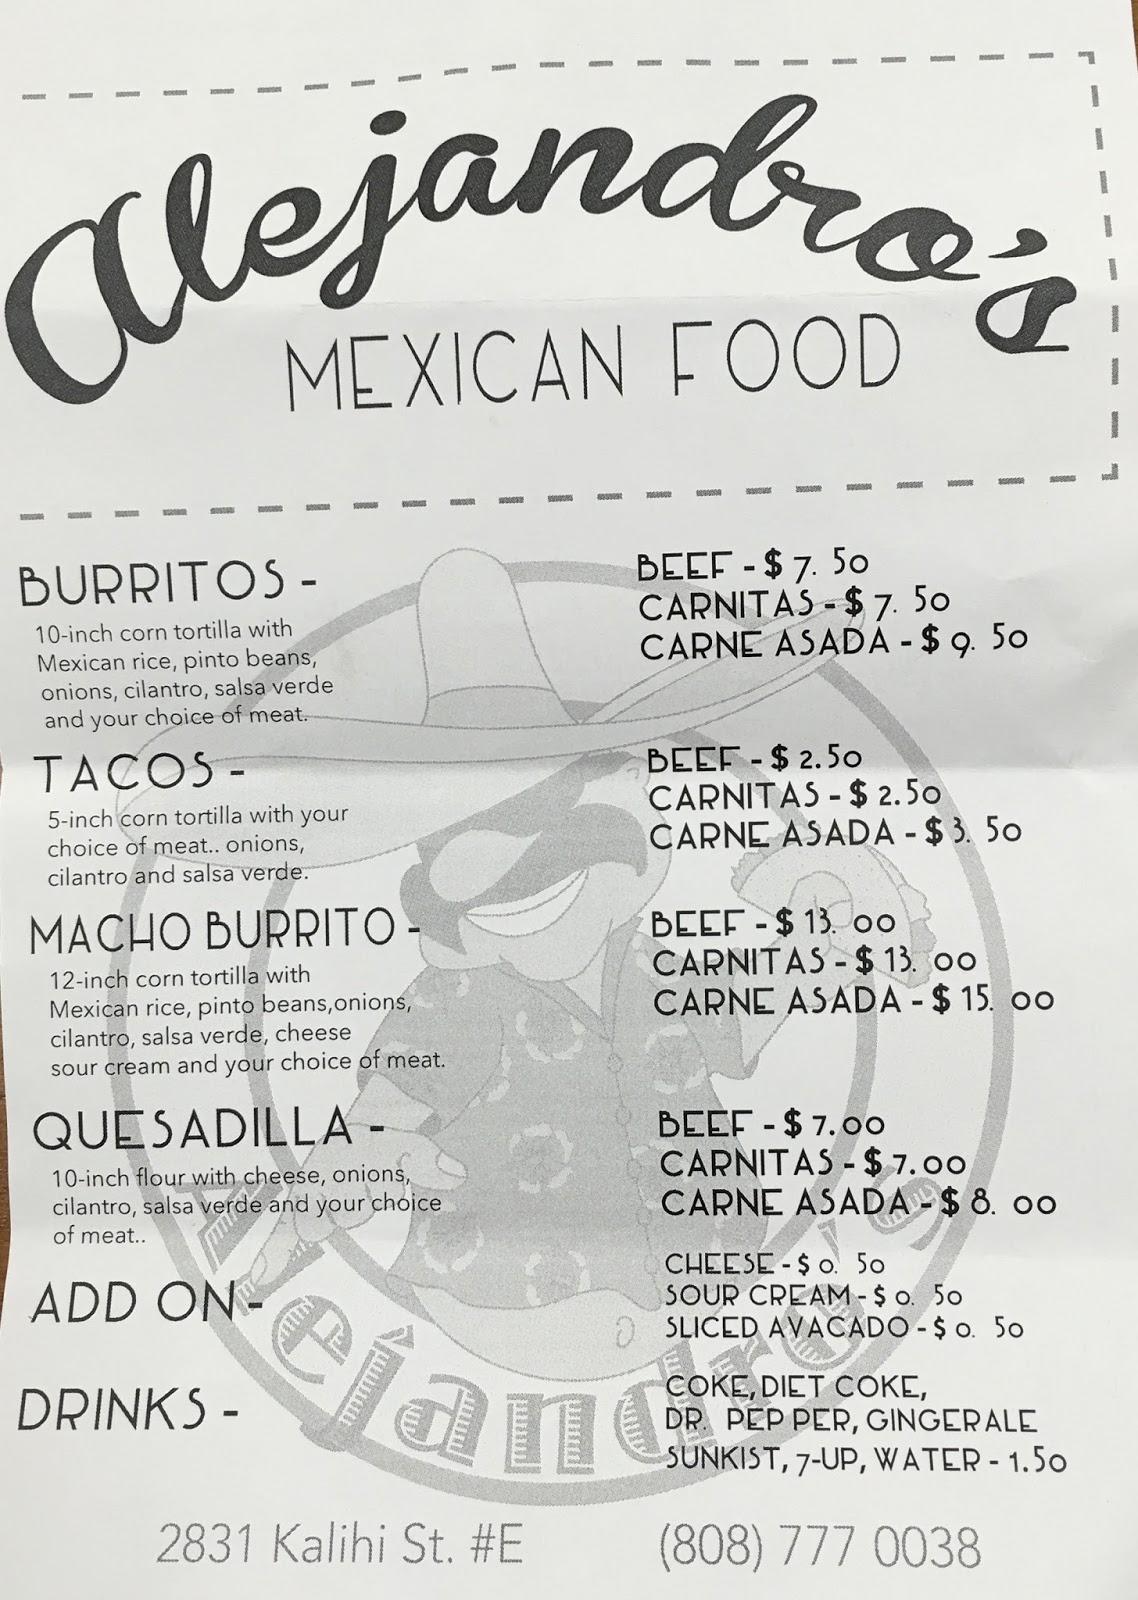 TASTE OF HAWAII: AJEJANDRO\'S MEXICAN FOOD